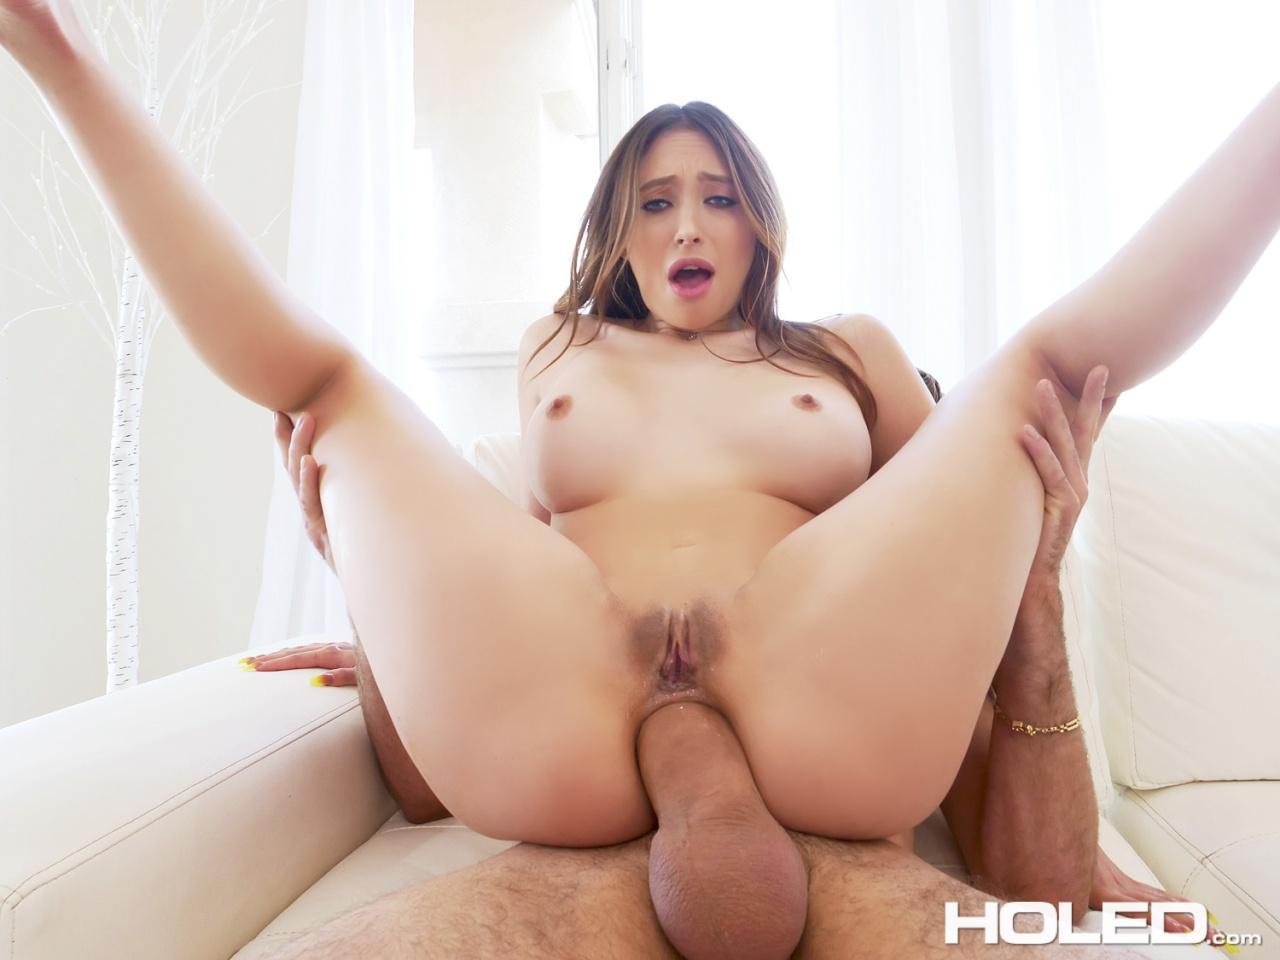 Holed: Quinn Wilde - Butt Plug Jog